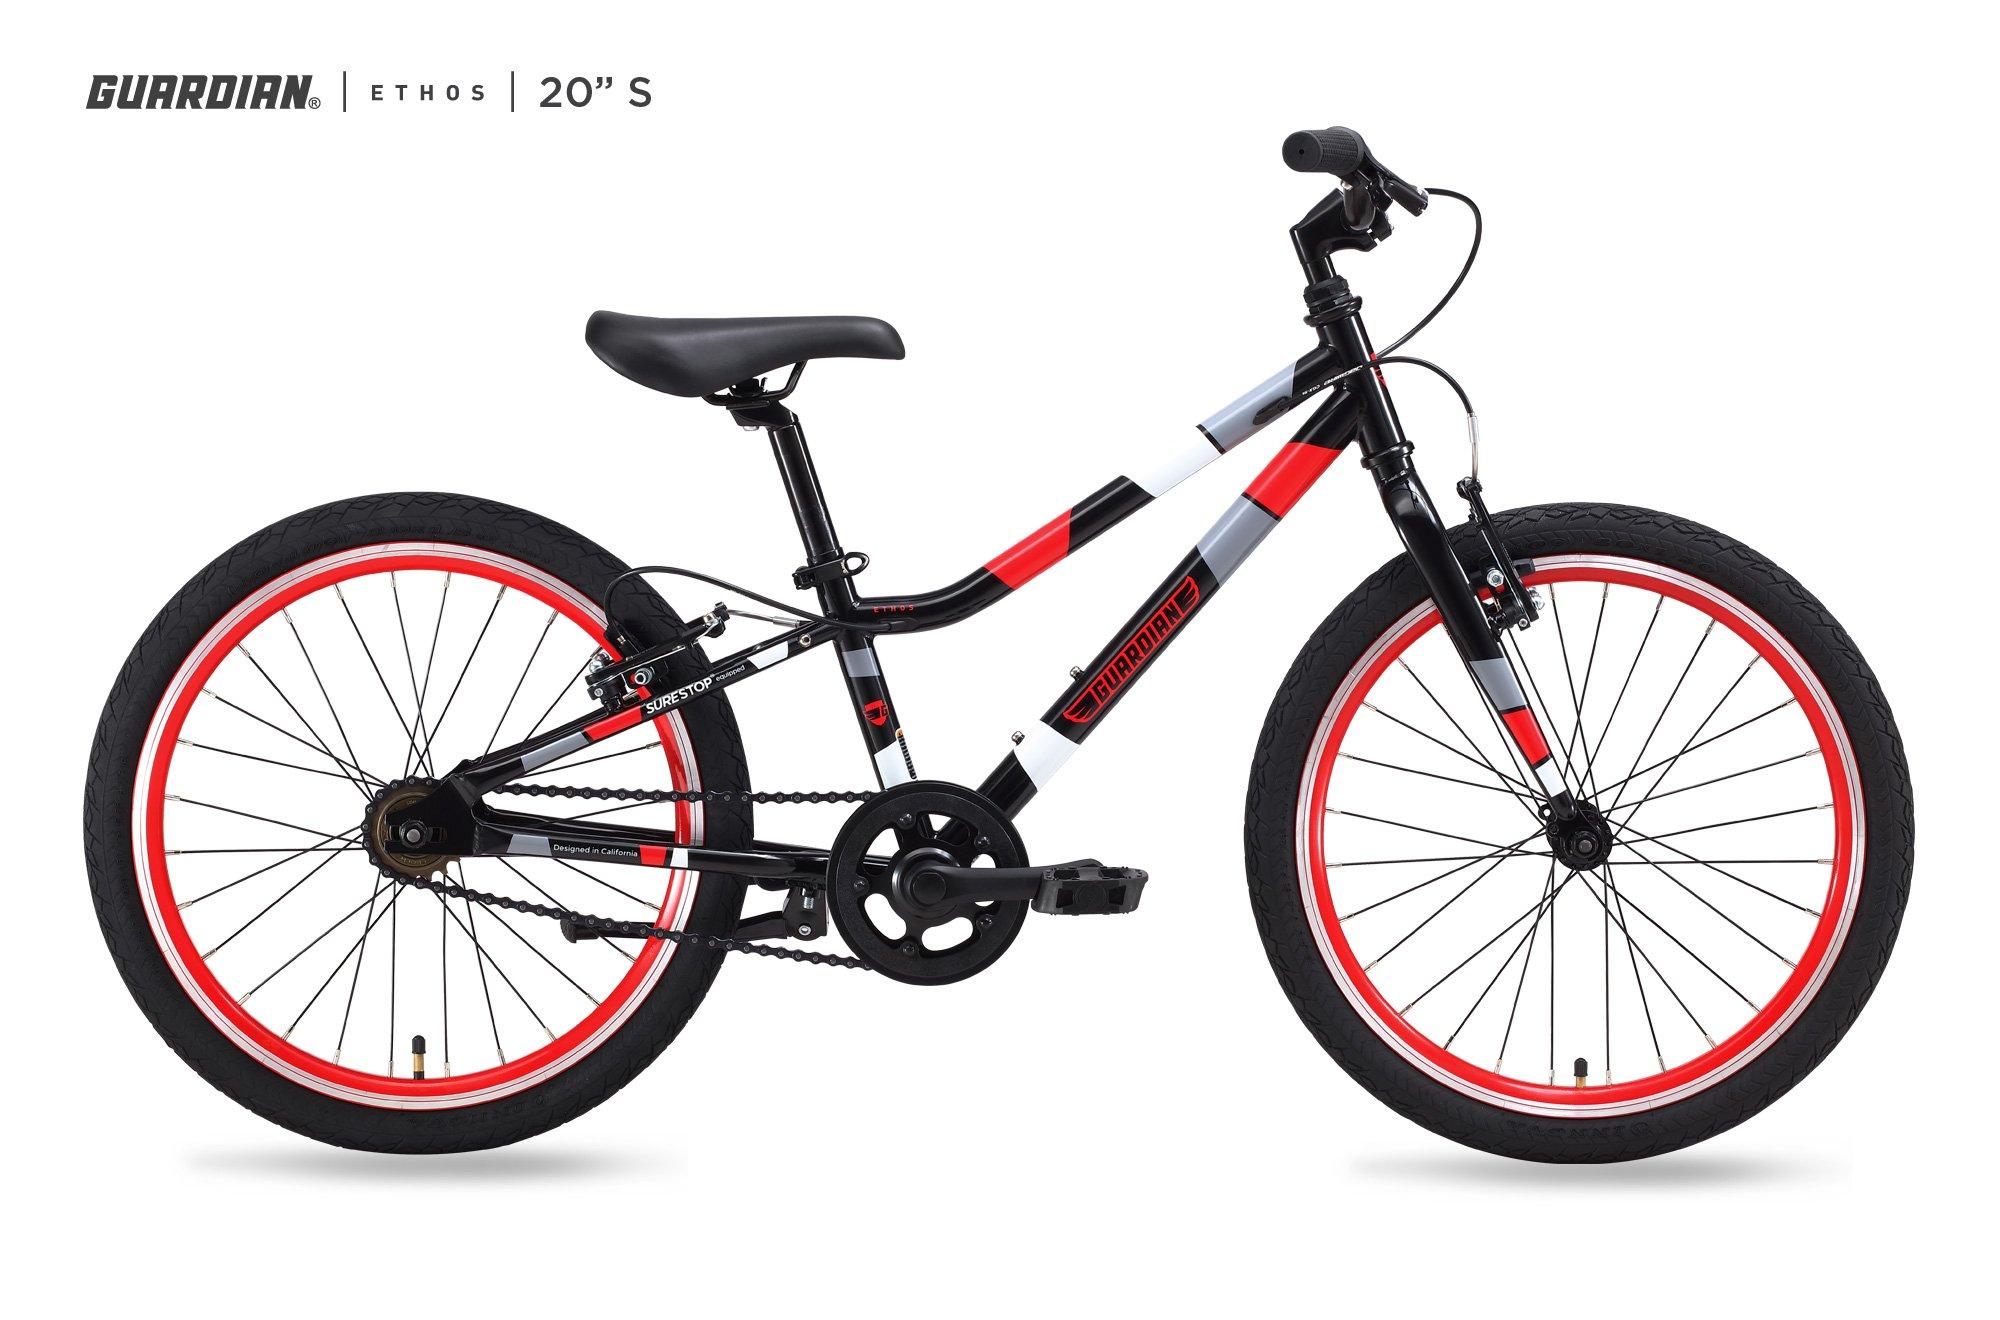 Guardian Kids Bikes Ethos. 16/20/24 Inch, Multiple Colors for Boys/Girls. Safer Brake System for Kids. Lightweight Steel Construction. Easy Assembly. ASO SharkTank. product image